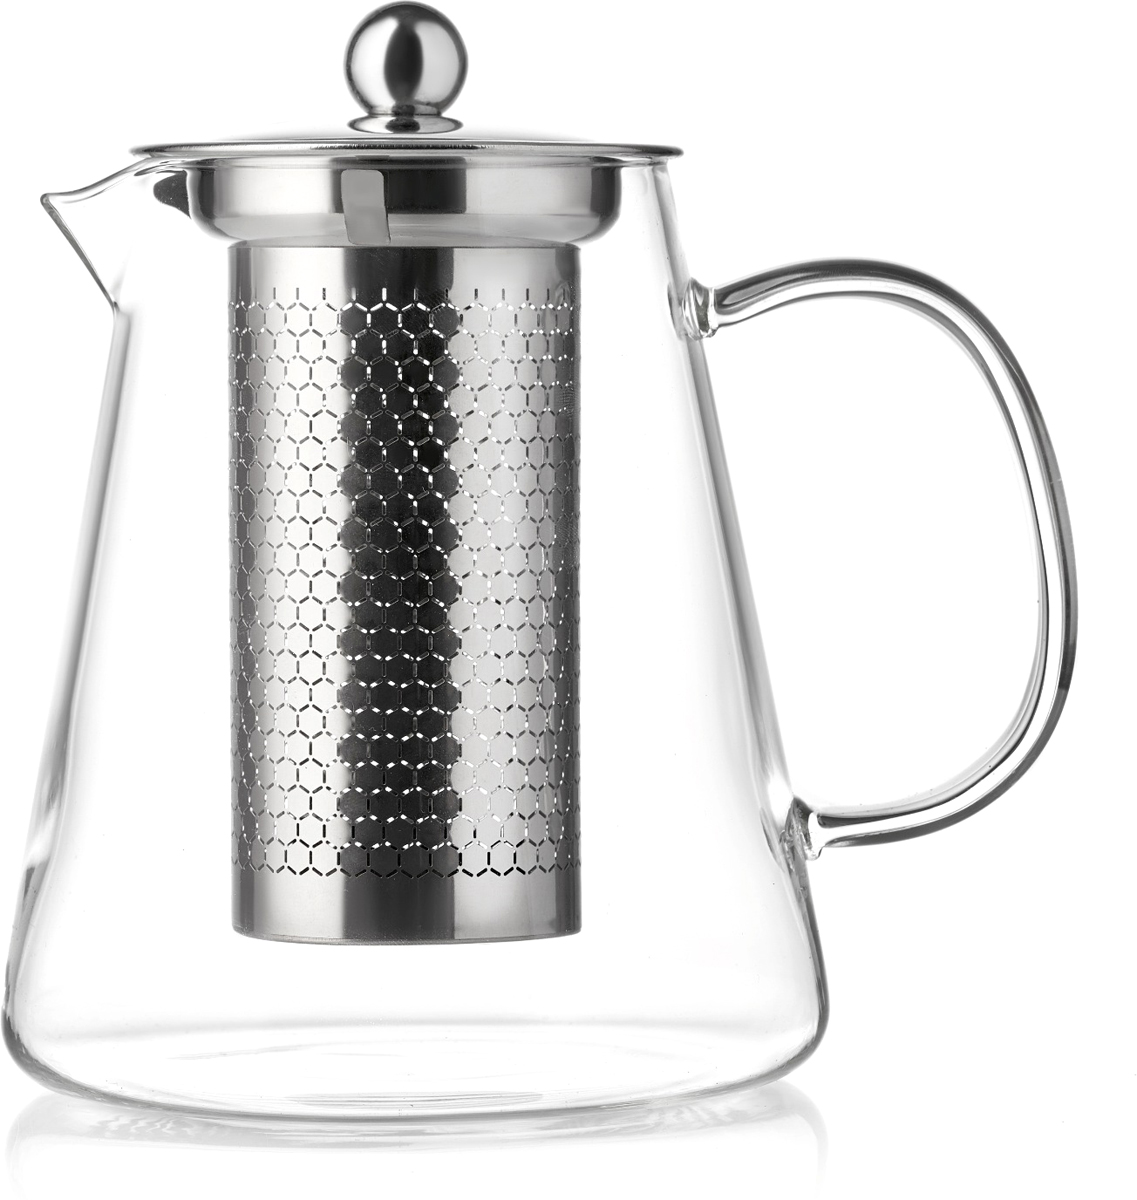 Чайник заварочный Walmer Sapphire, цвет: прозрачный, 1 л заварочный чайник yf 6601